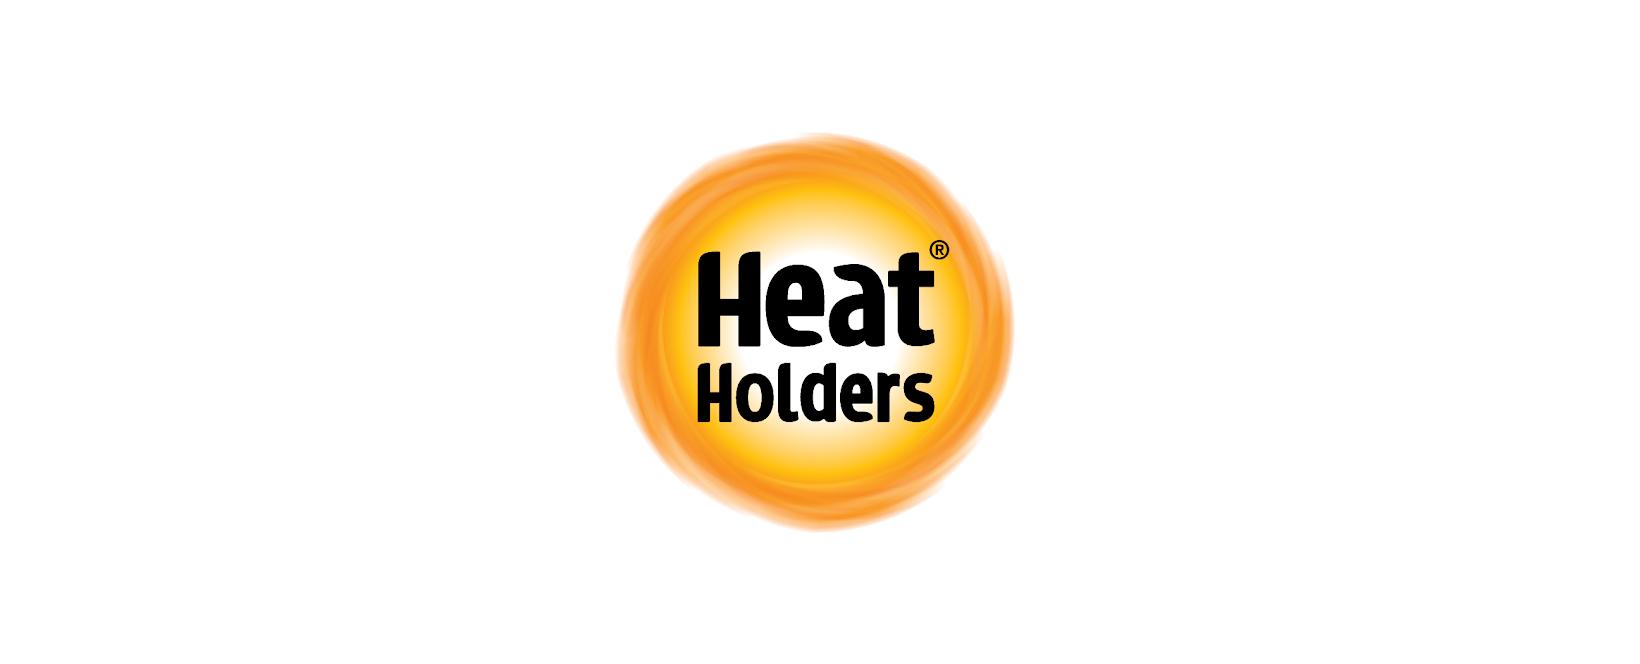 Heat Holders Promo Code 2021